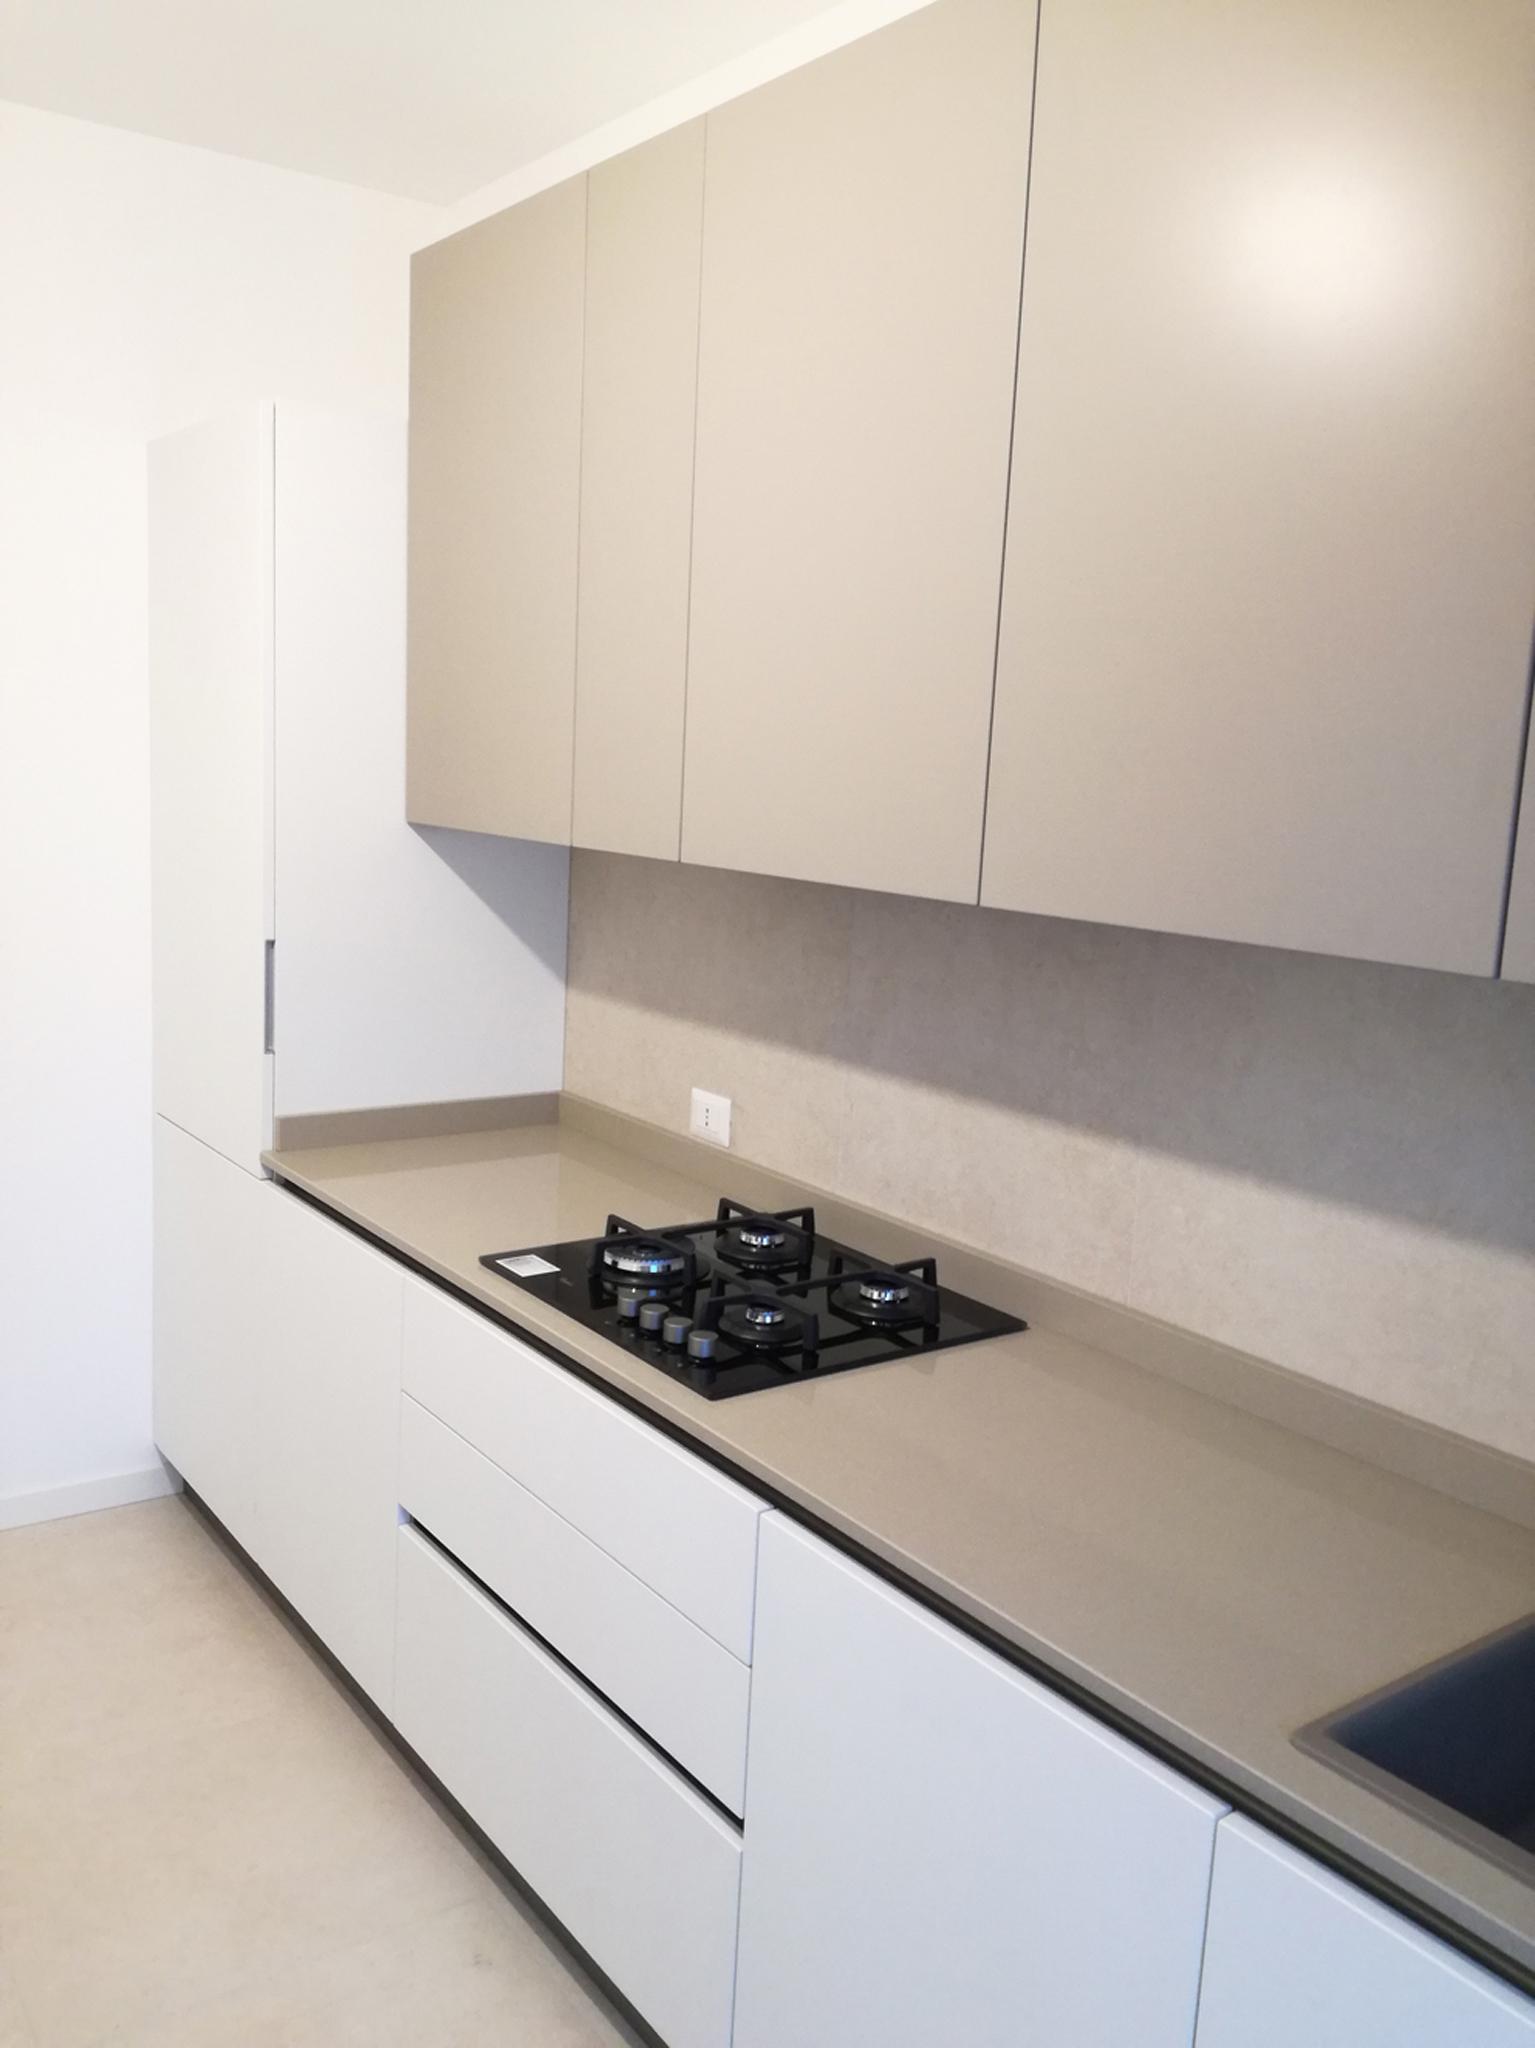 Cucina Smart Bianco Opaco e Grigio Tortora  Arredamenti Barin